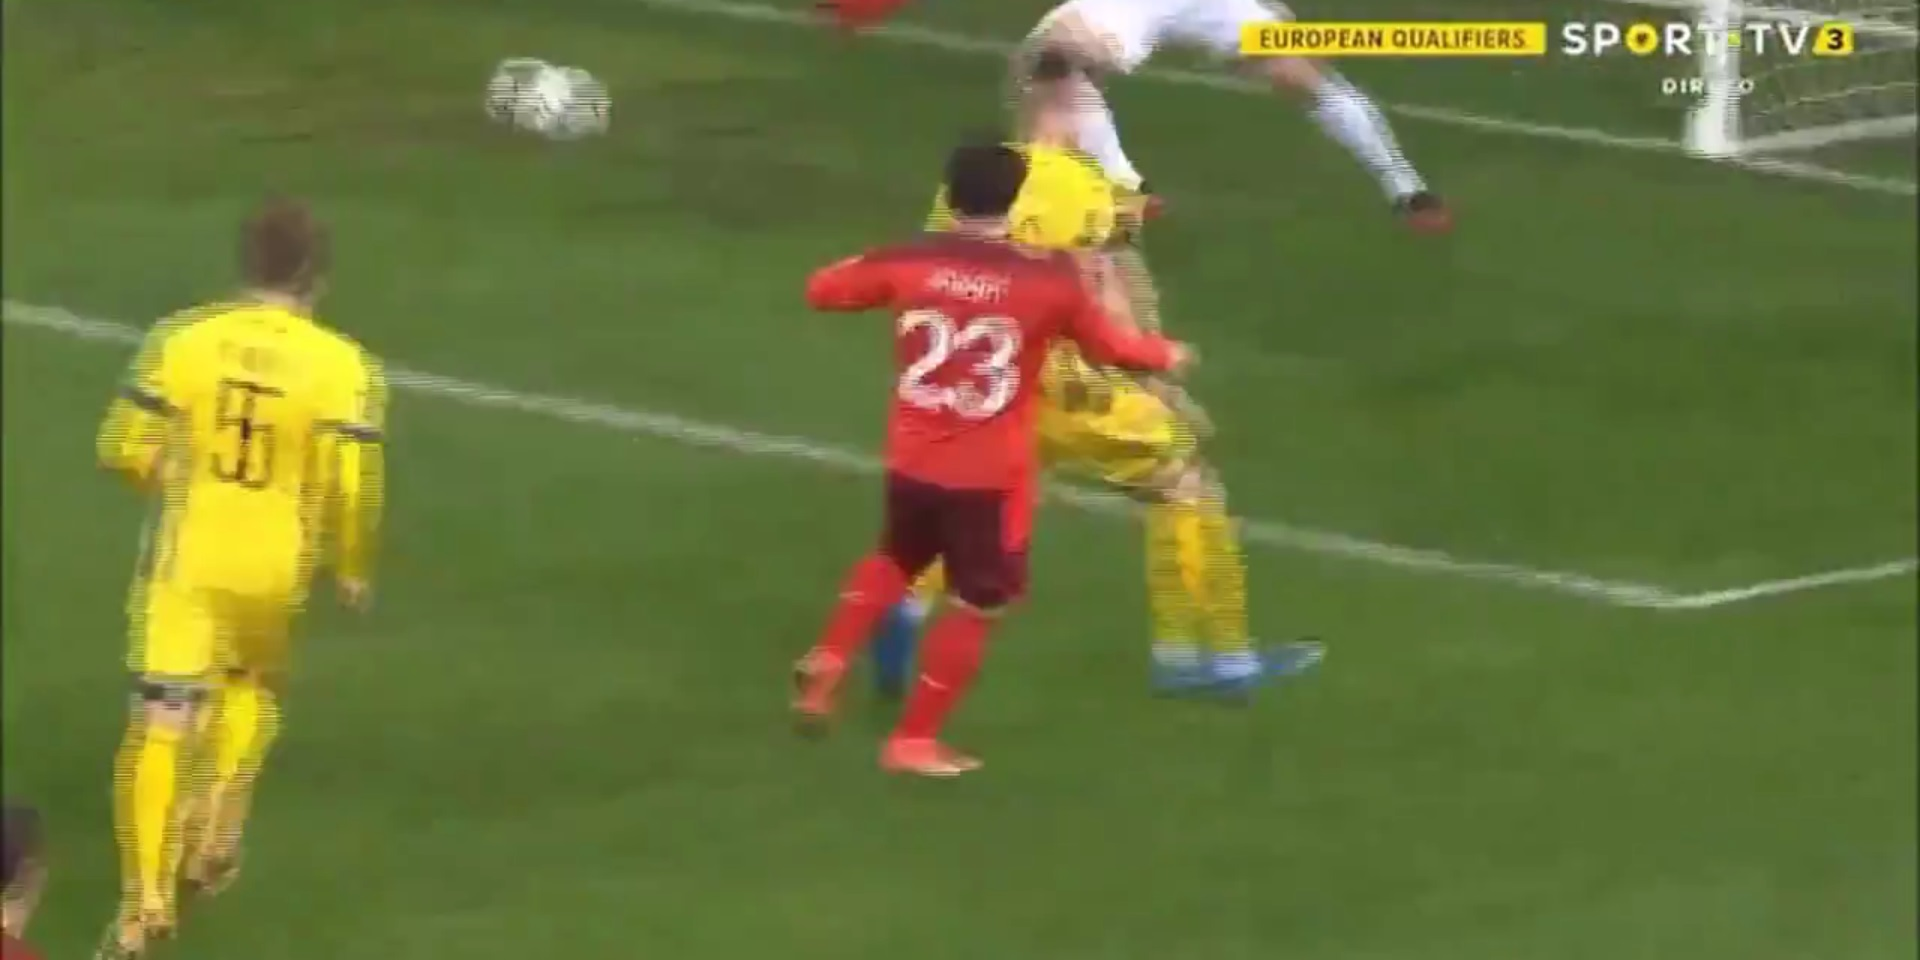 (Video) Shaqiri capitalises on Switzerland high-press & bags match-winner